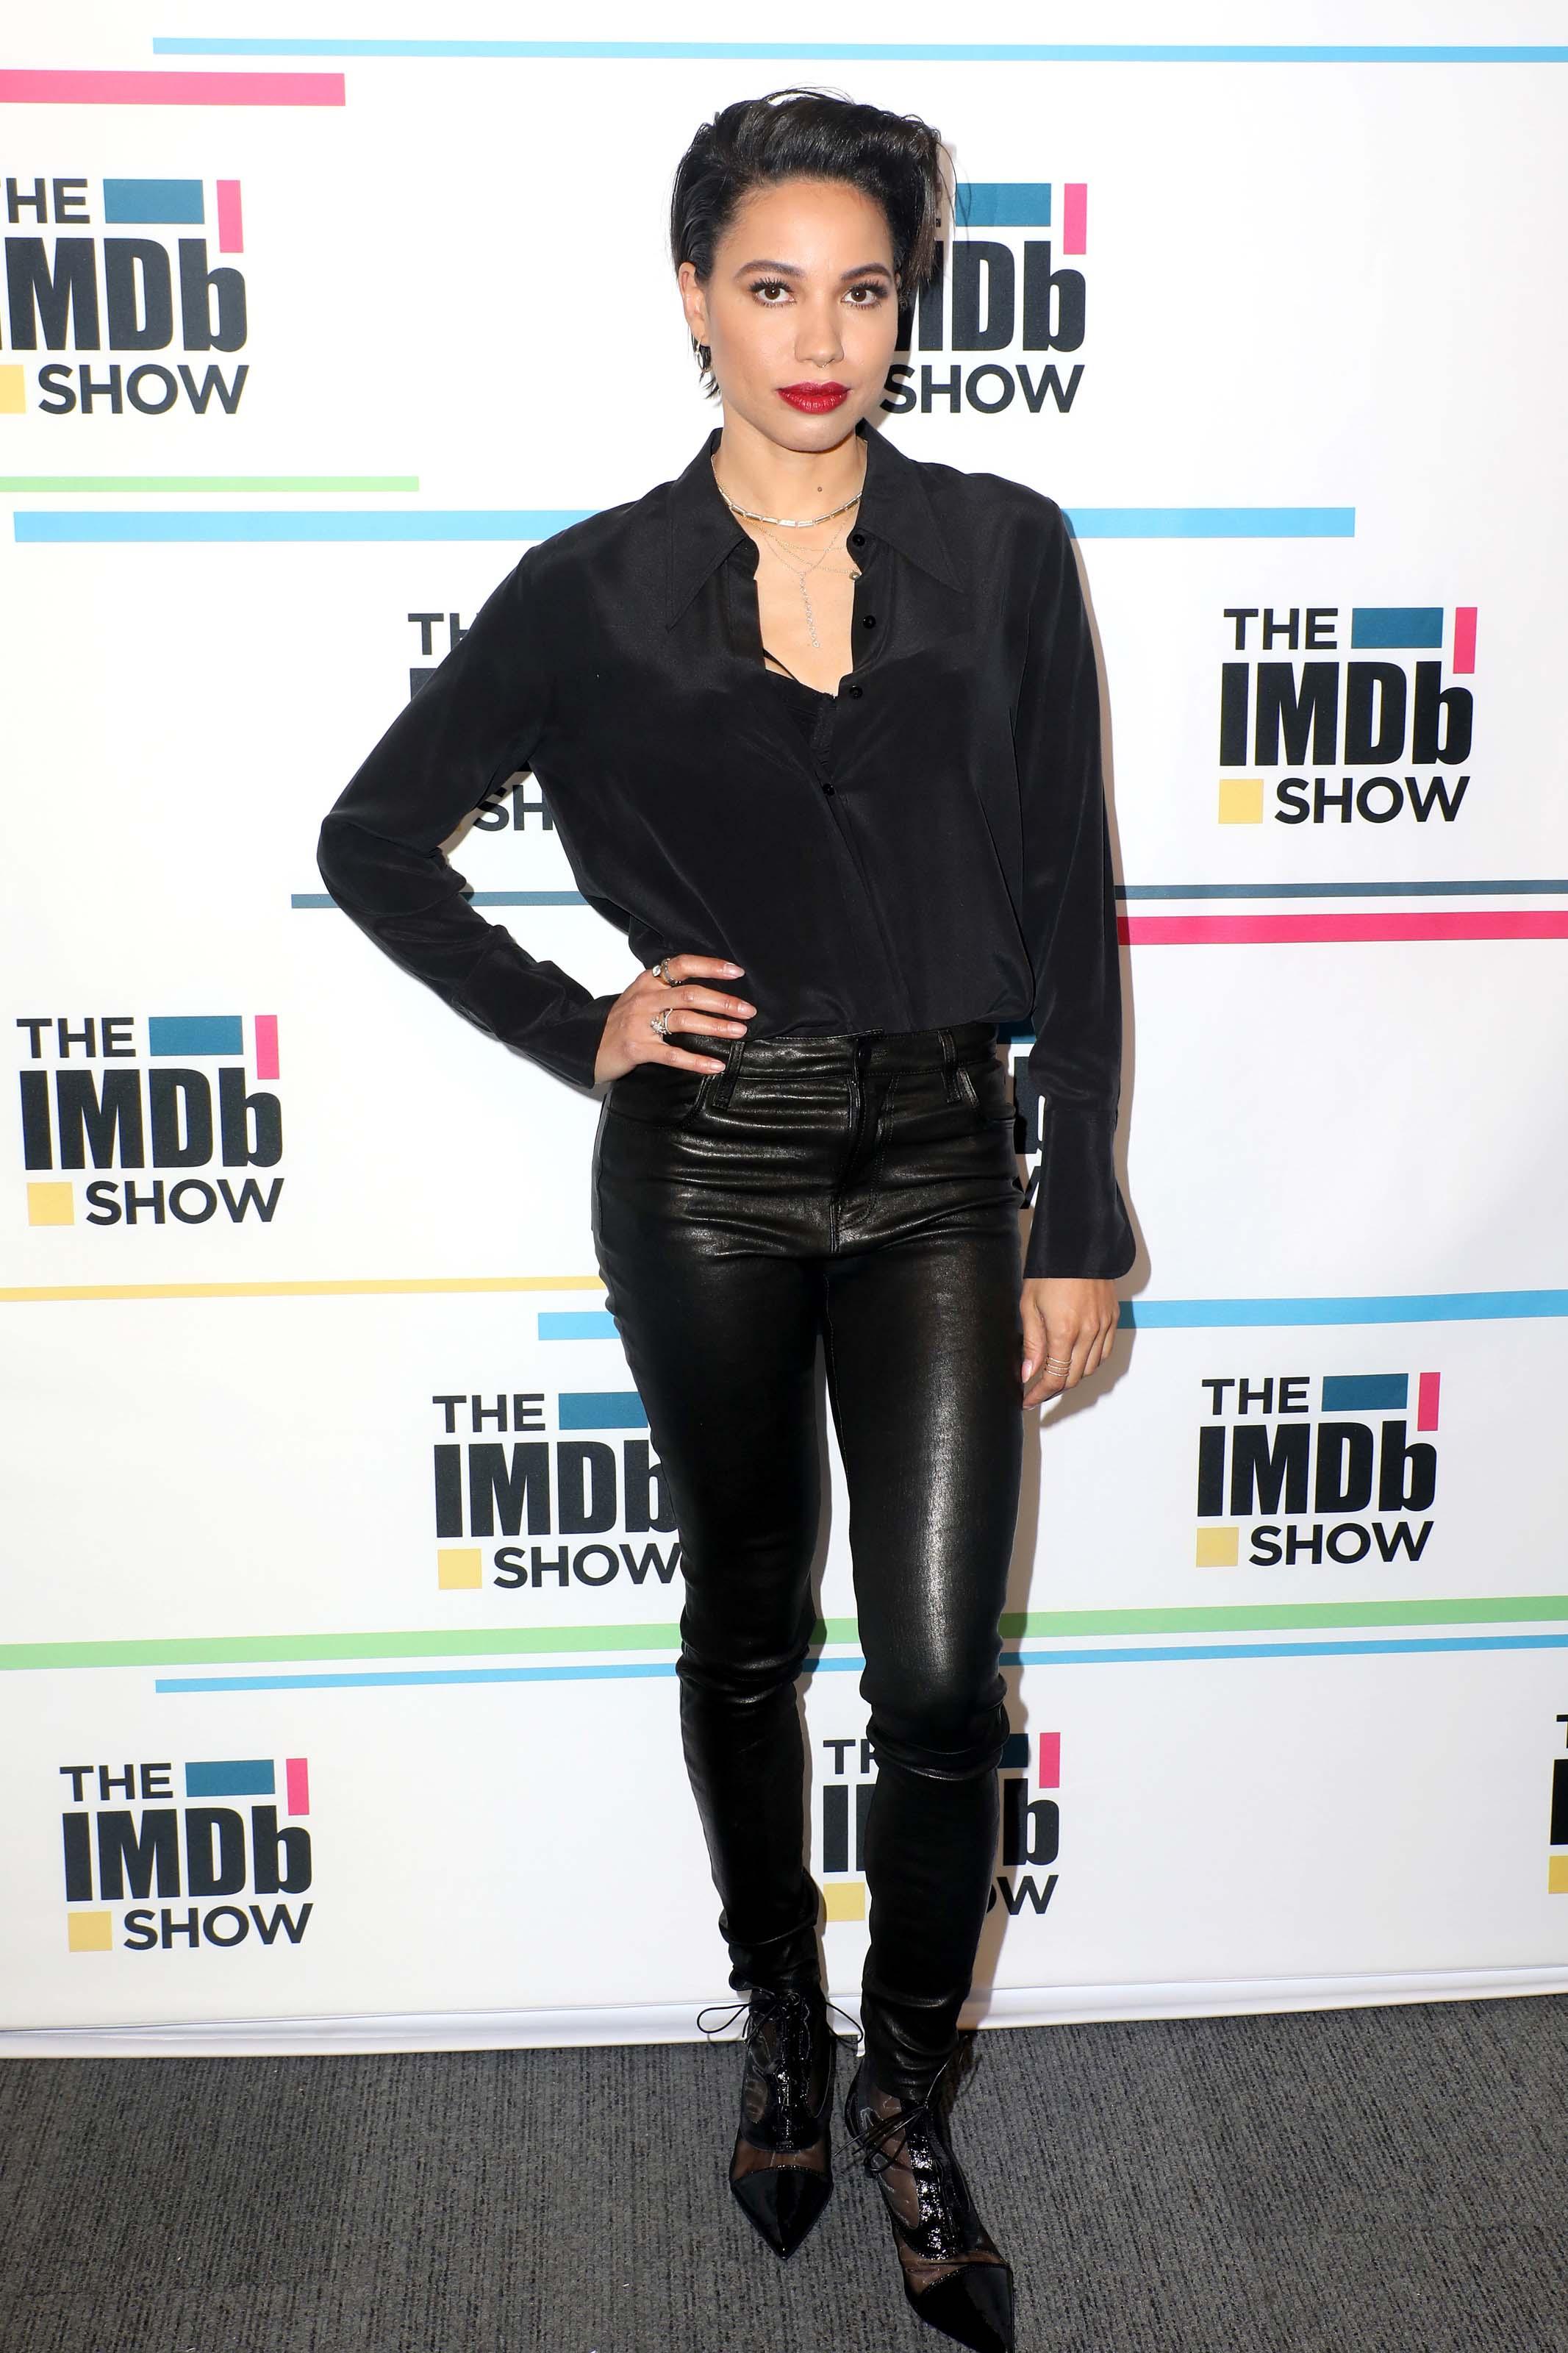 Jurnee Smollett-Bell on the IMDb Show